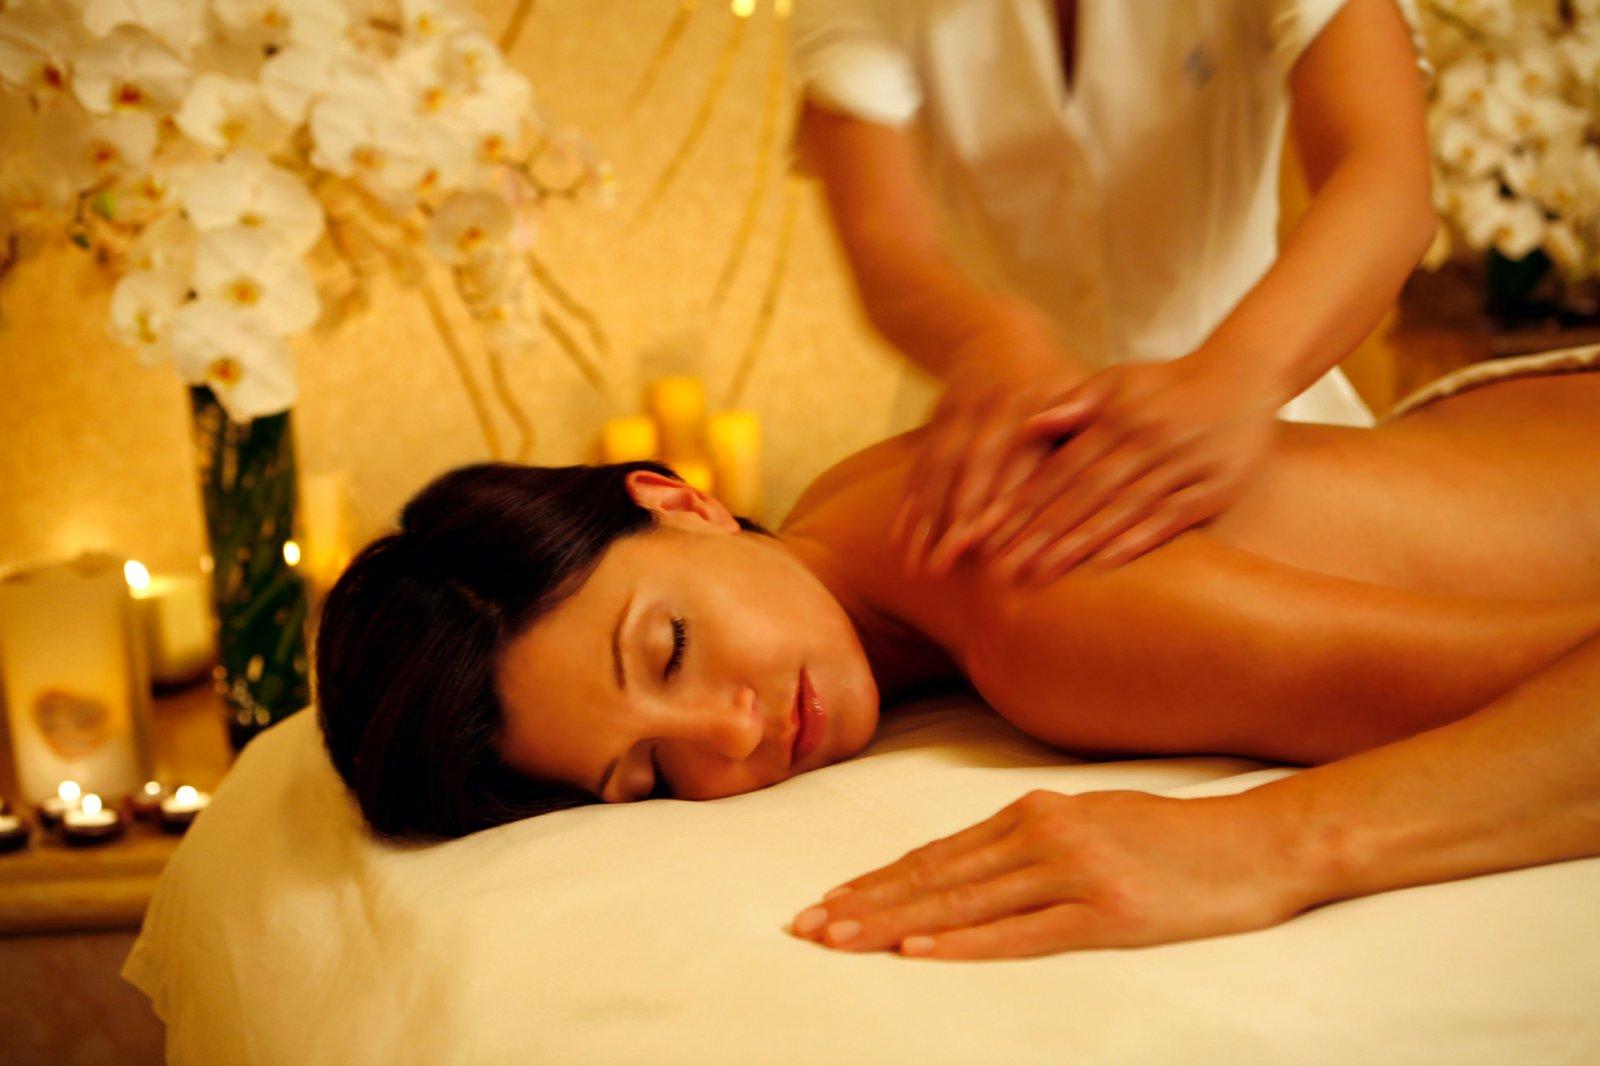 Shemal escort french sexy massage